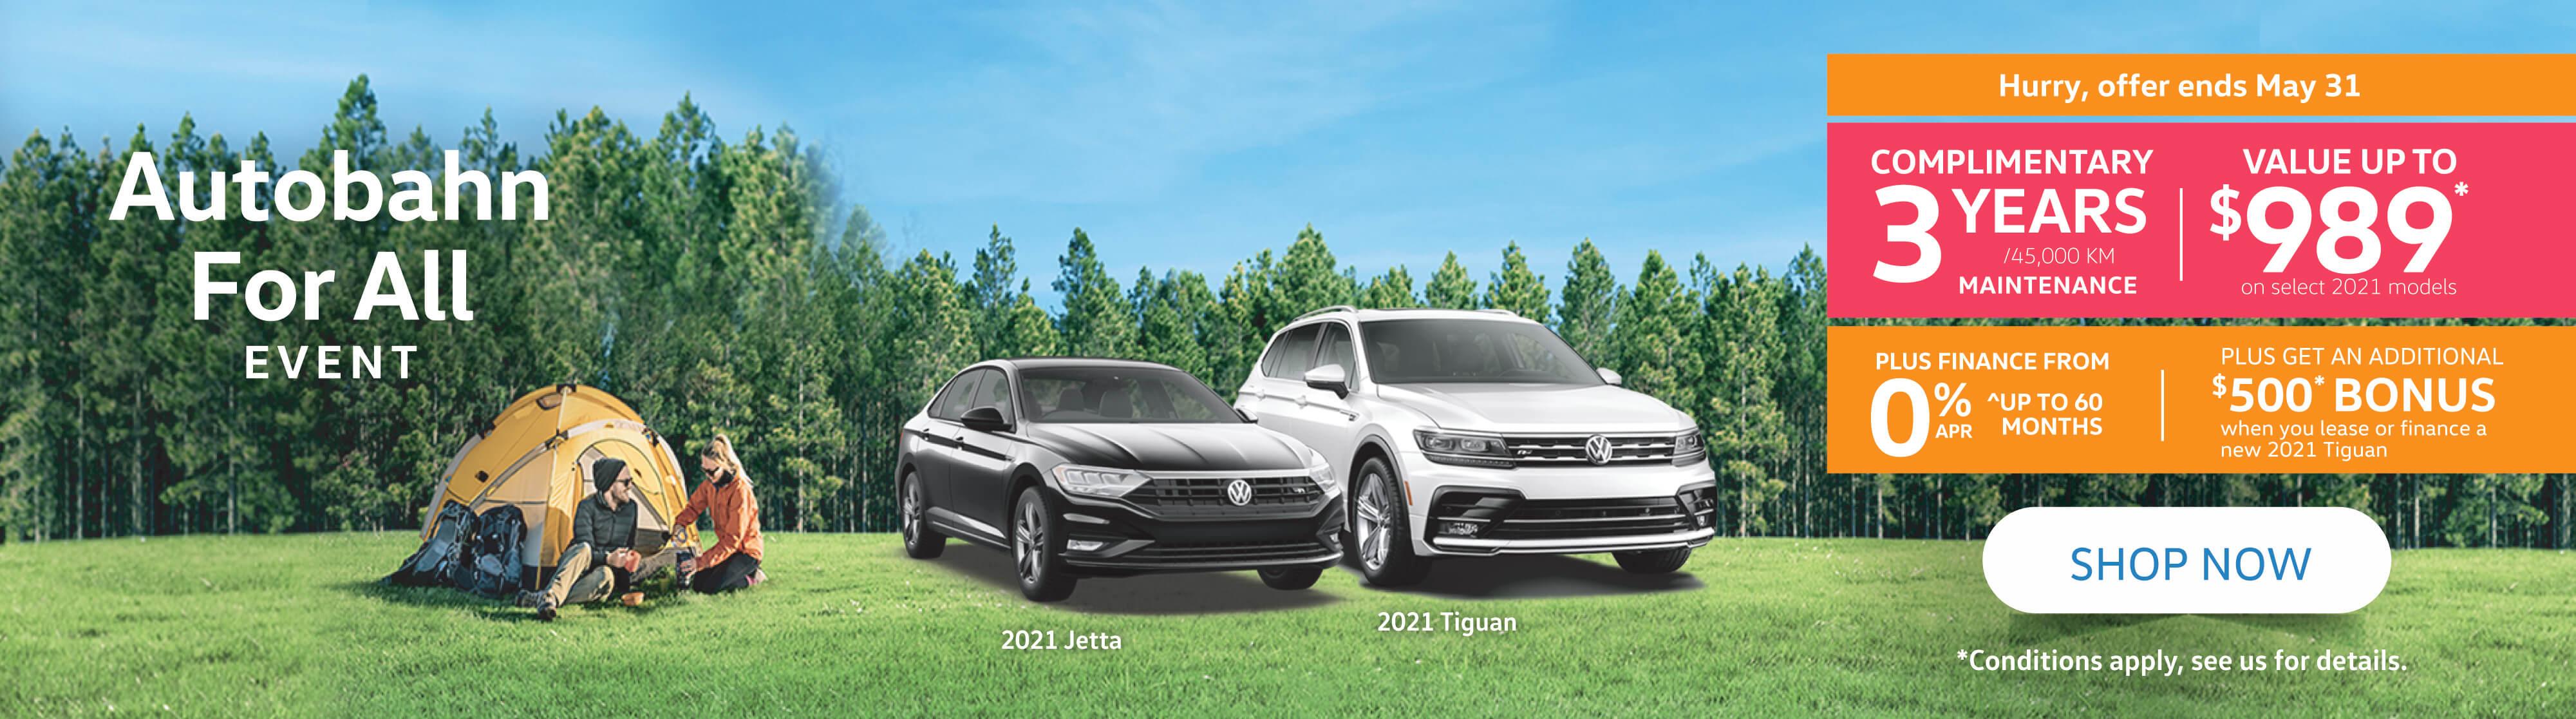 Volkswagen - Autobahn For All